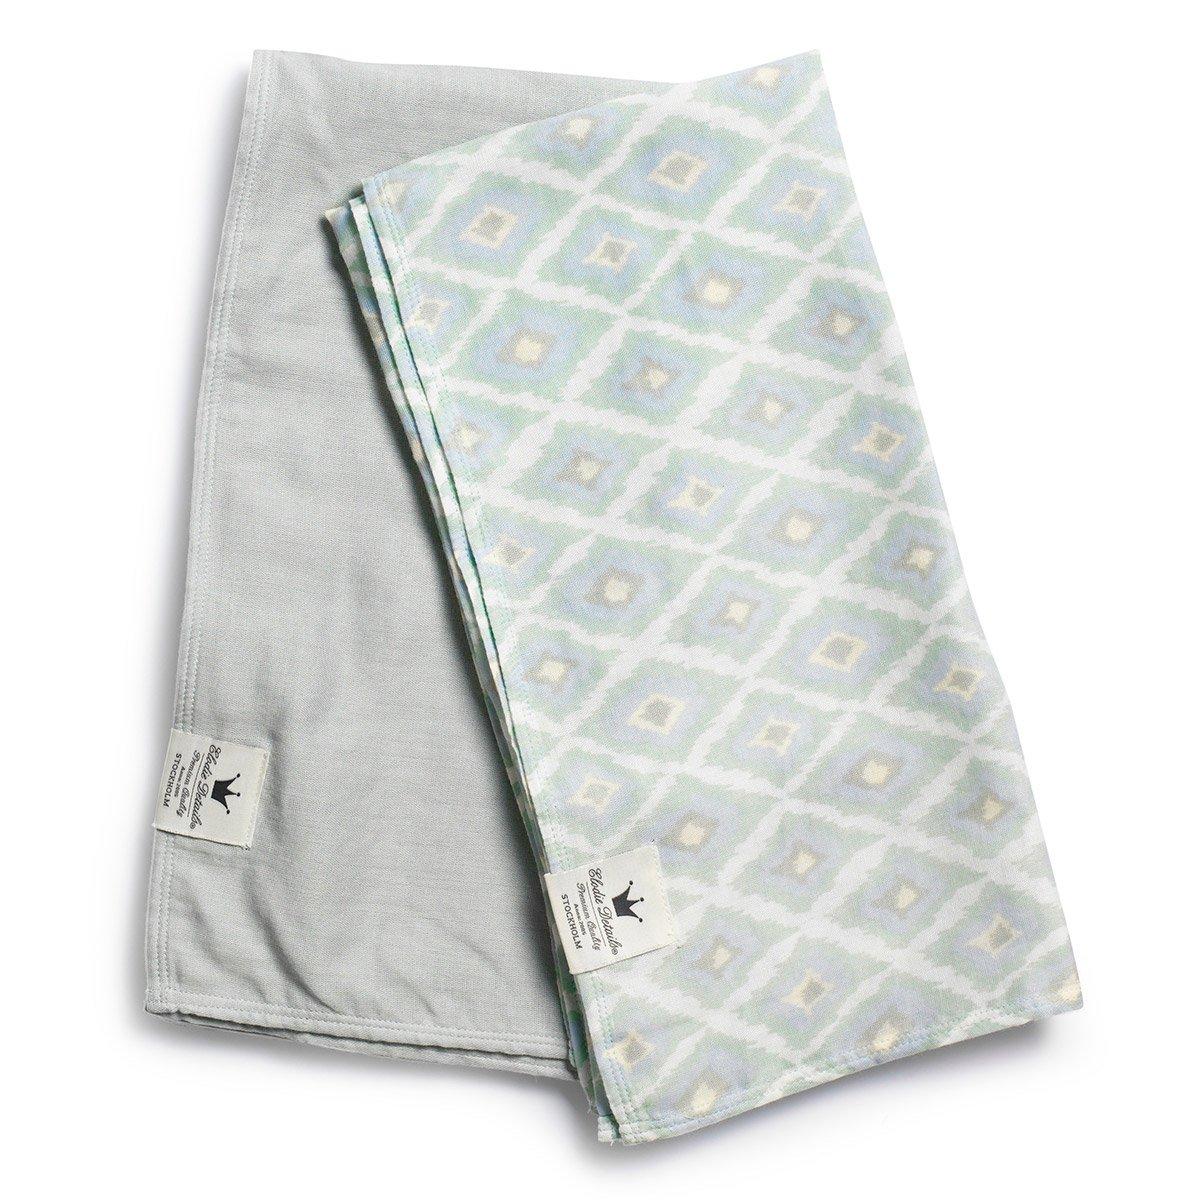 Elodie Details 7350041673132 Bambus-Musselin-Decke, Colours of the Wind, grau MOLEO Sp.z o.o. ELODIEBLANKMUSCOLOURWIND